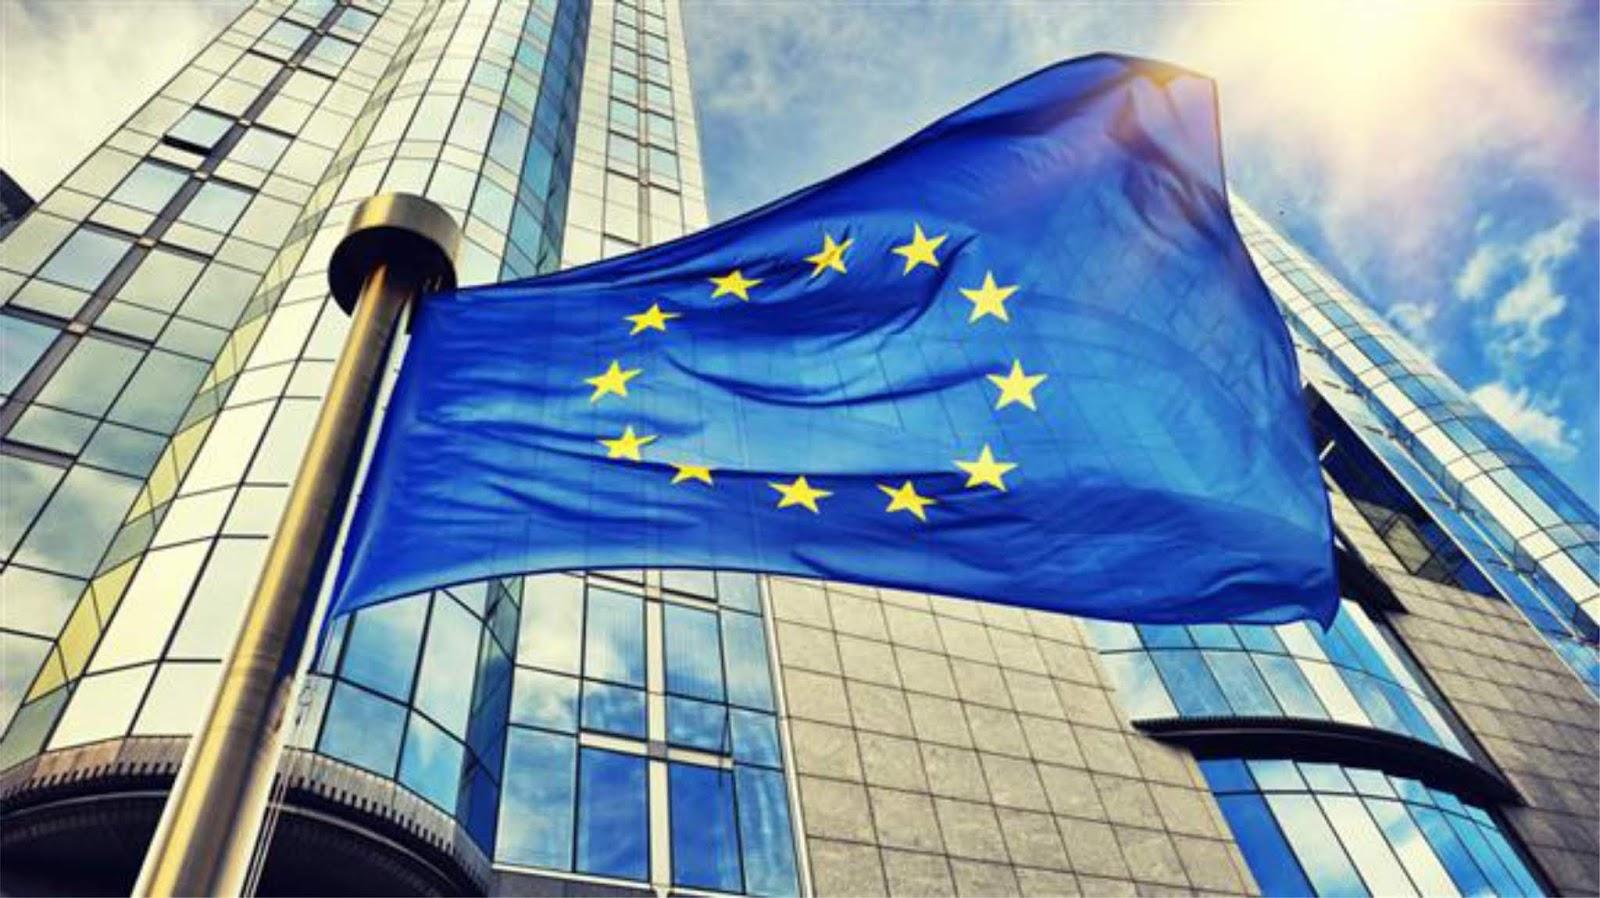 Komisaris Eropa menyebut ancaman utama ke UE